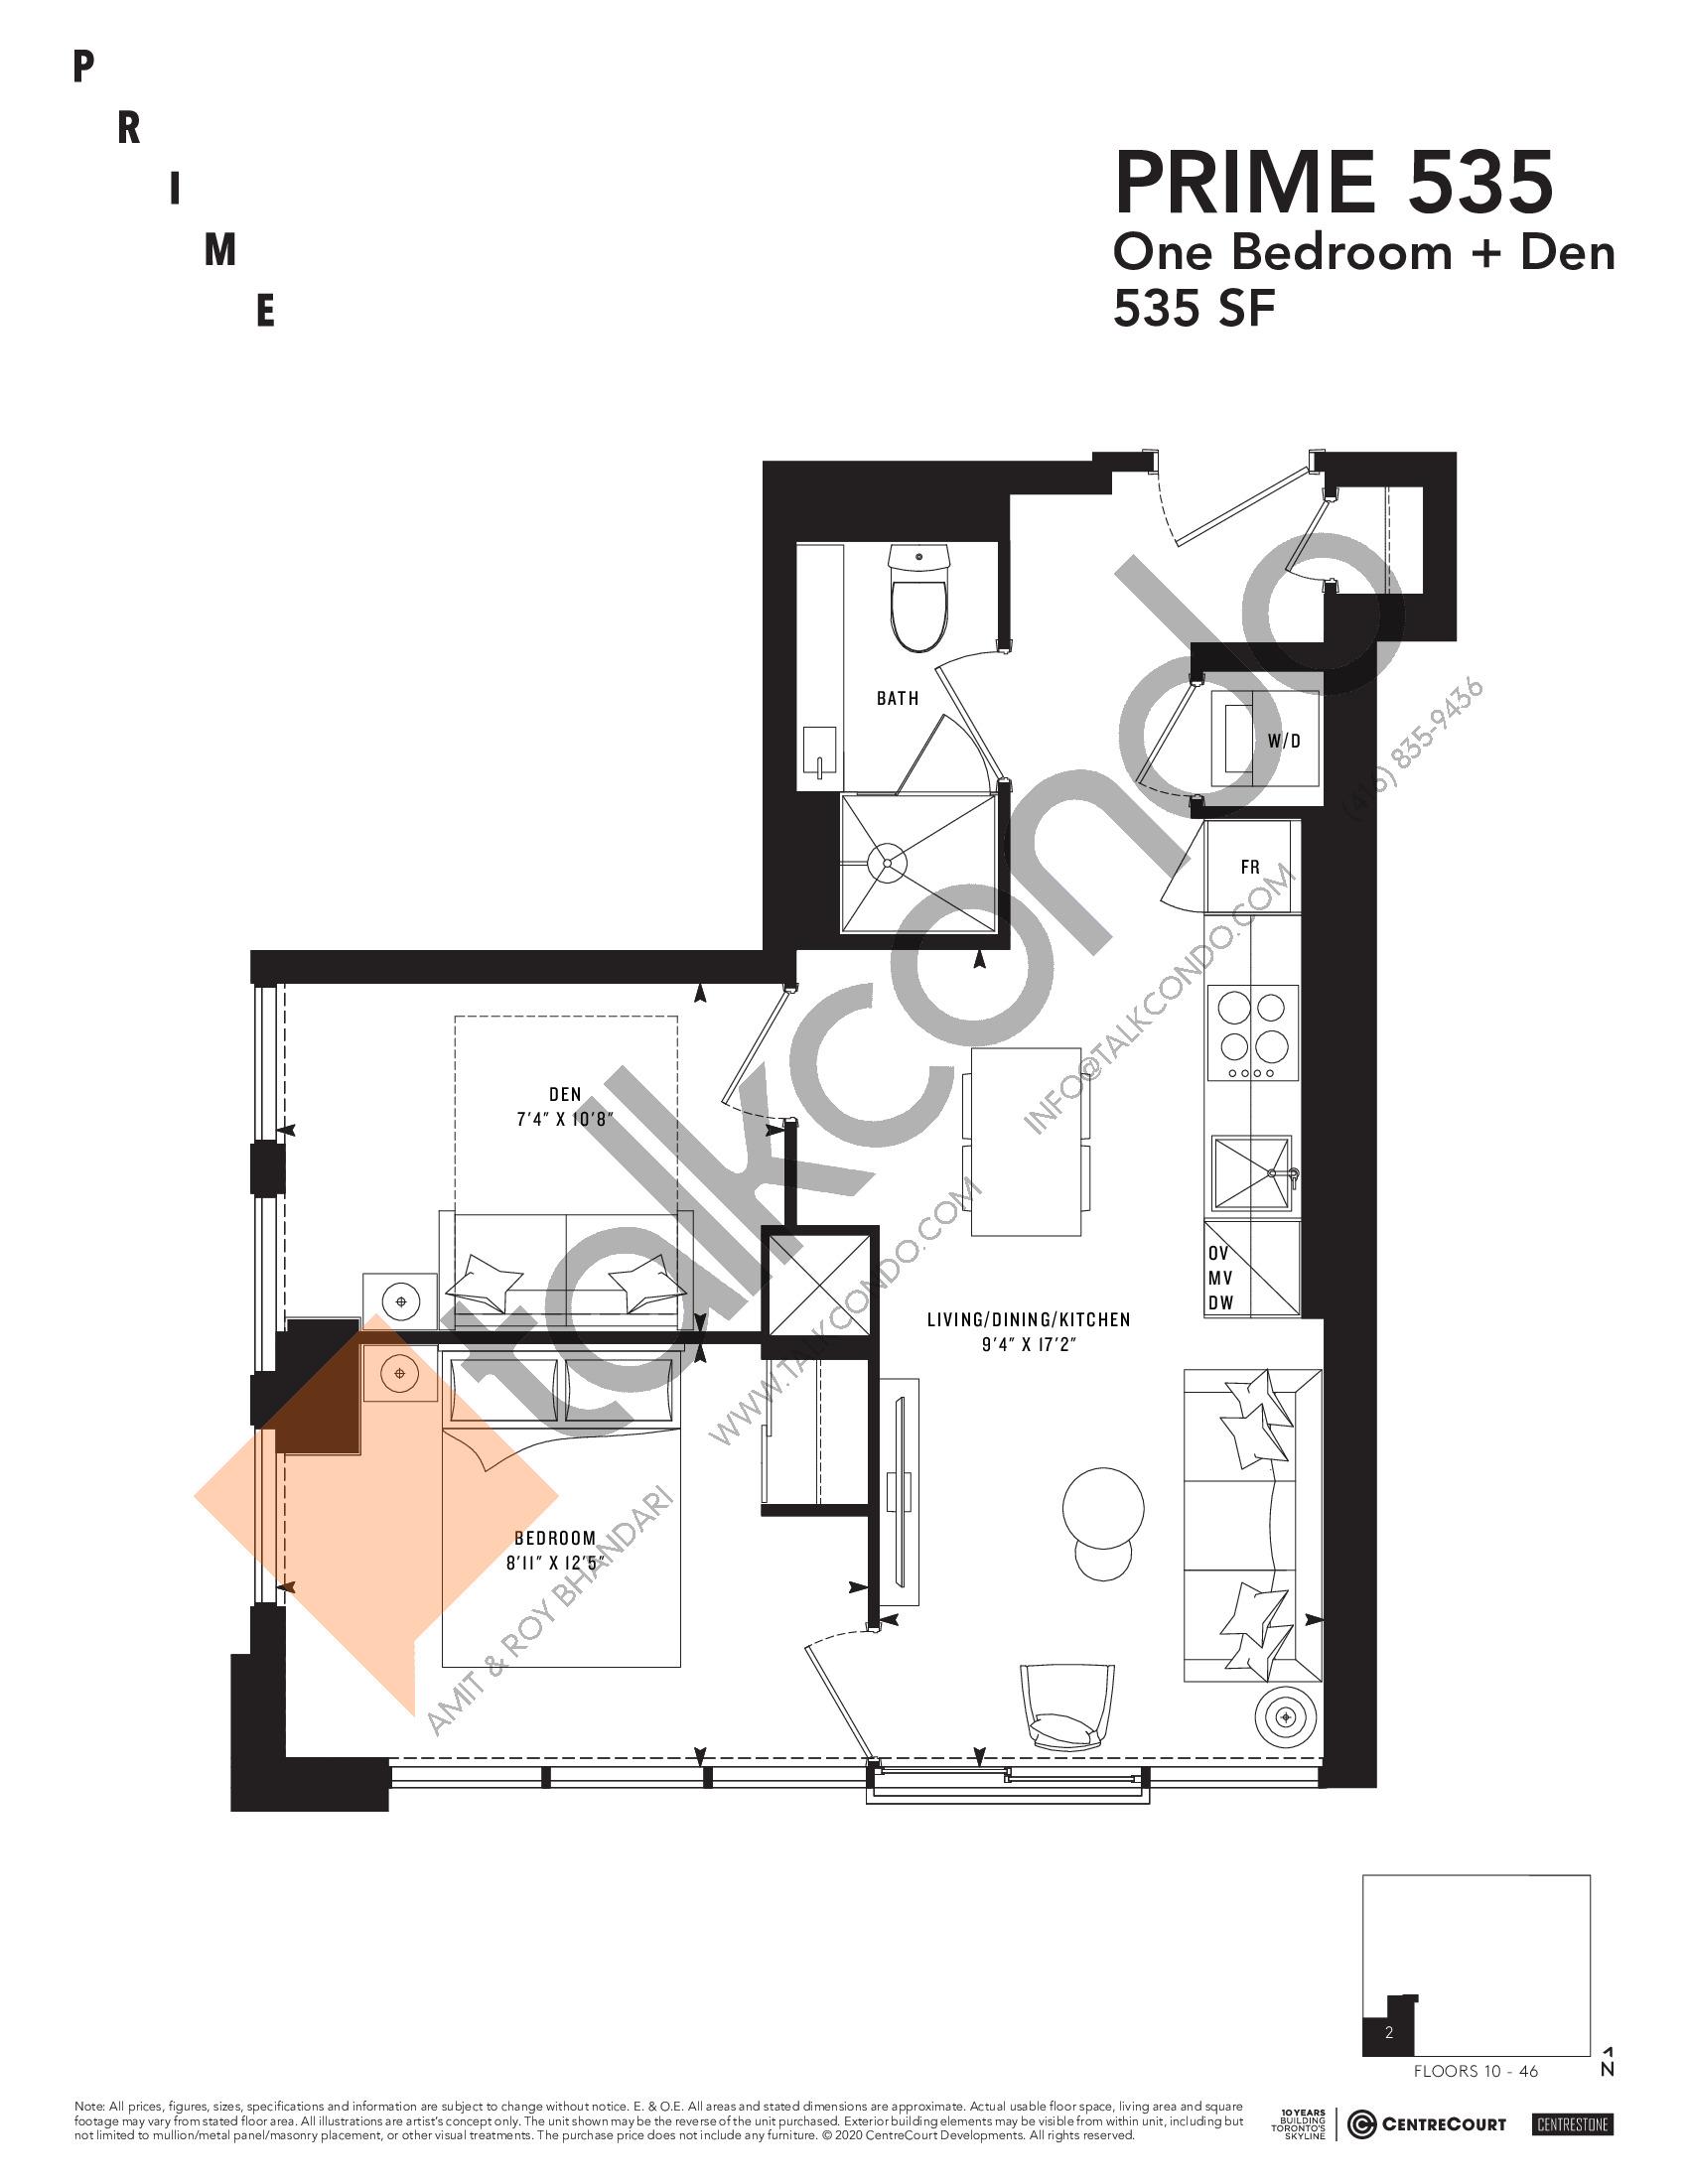 PRIME 535 Floor Plan at Prime Condos - 535 sq.ft